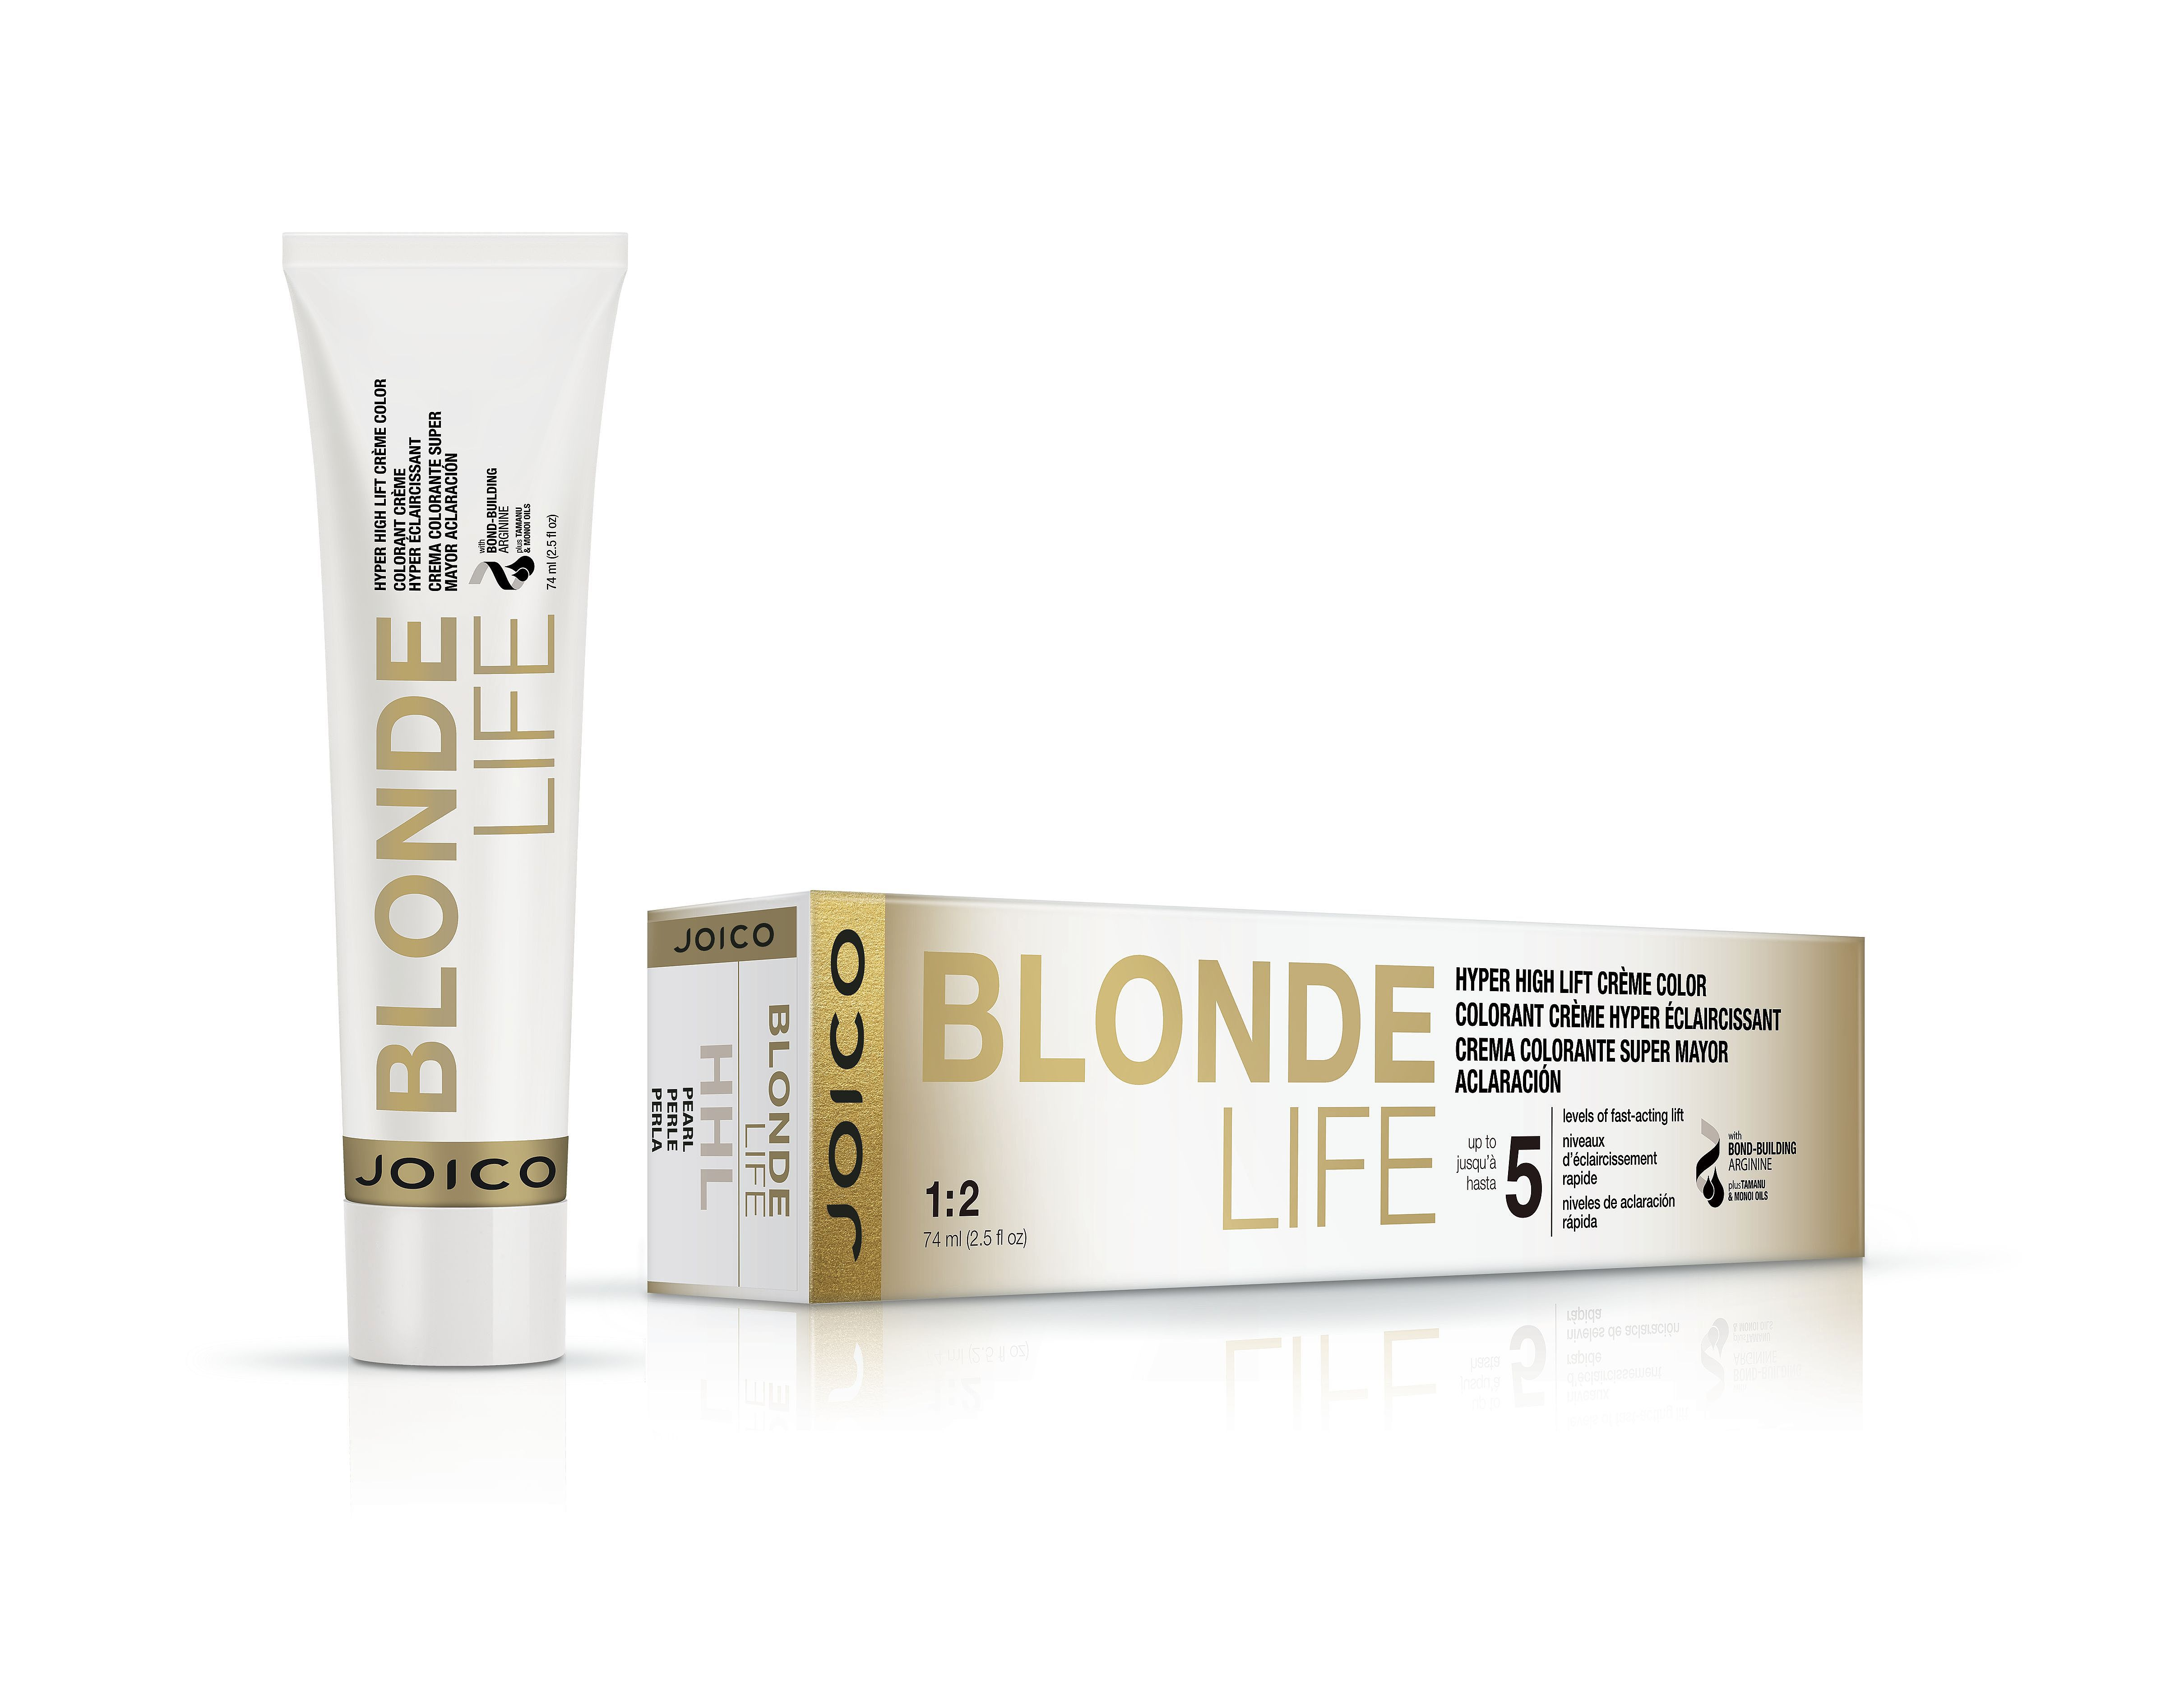 Blonde-Life-Color-Hyper-High-Lift-Tube